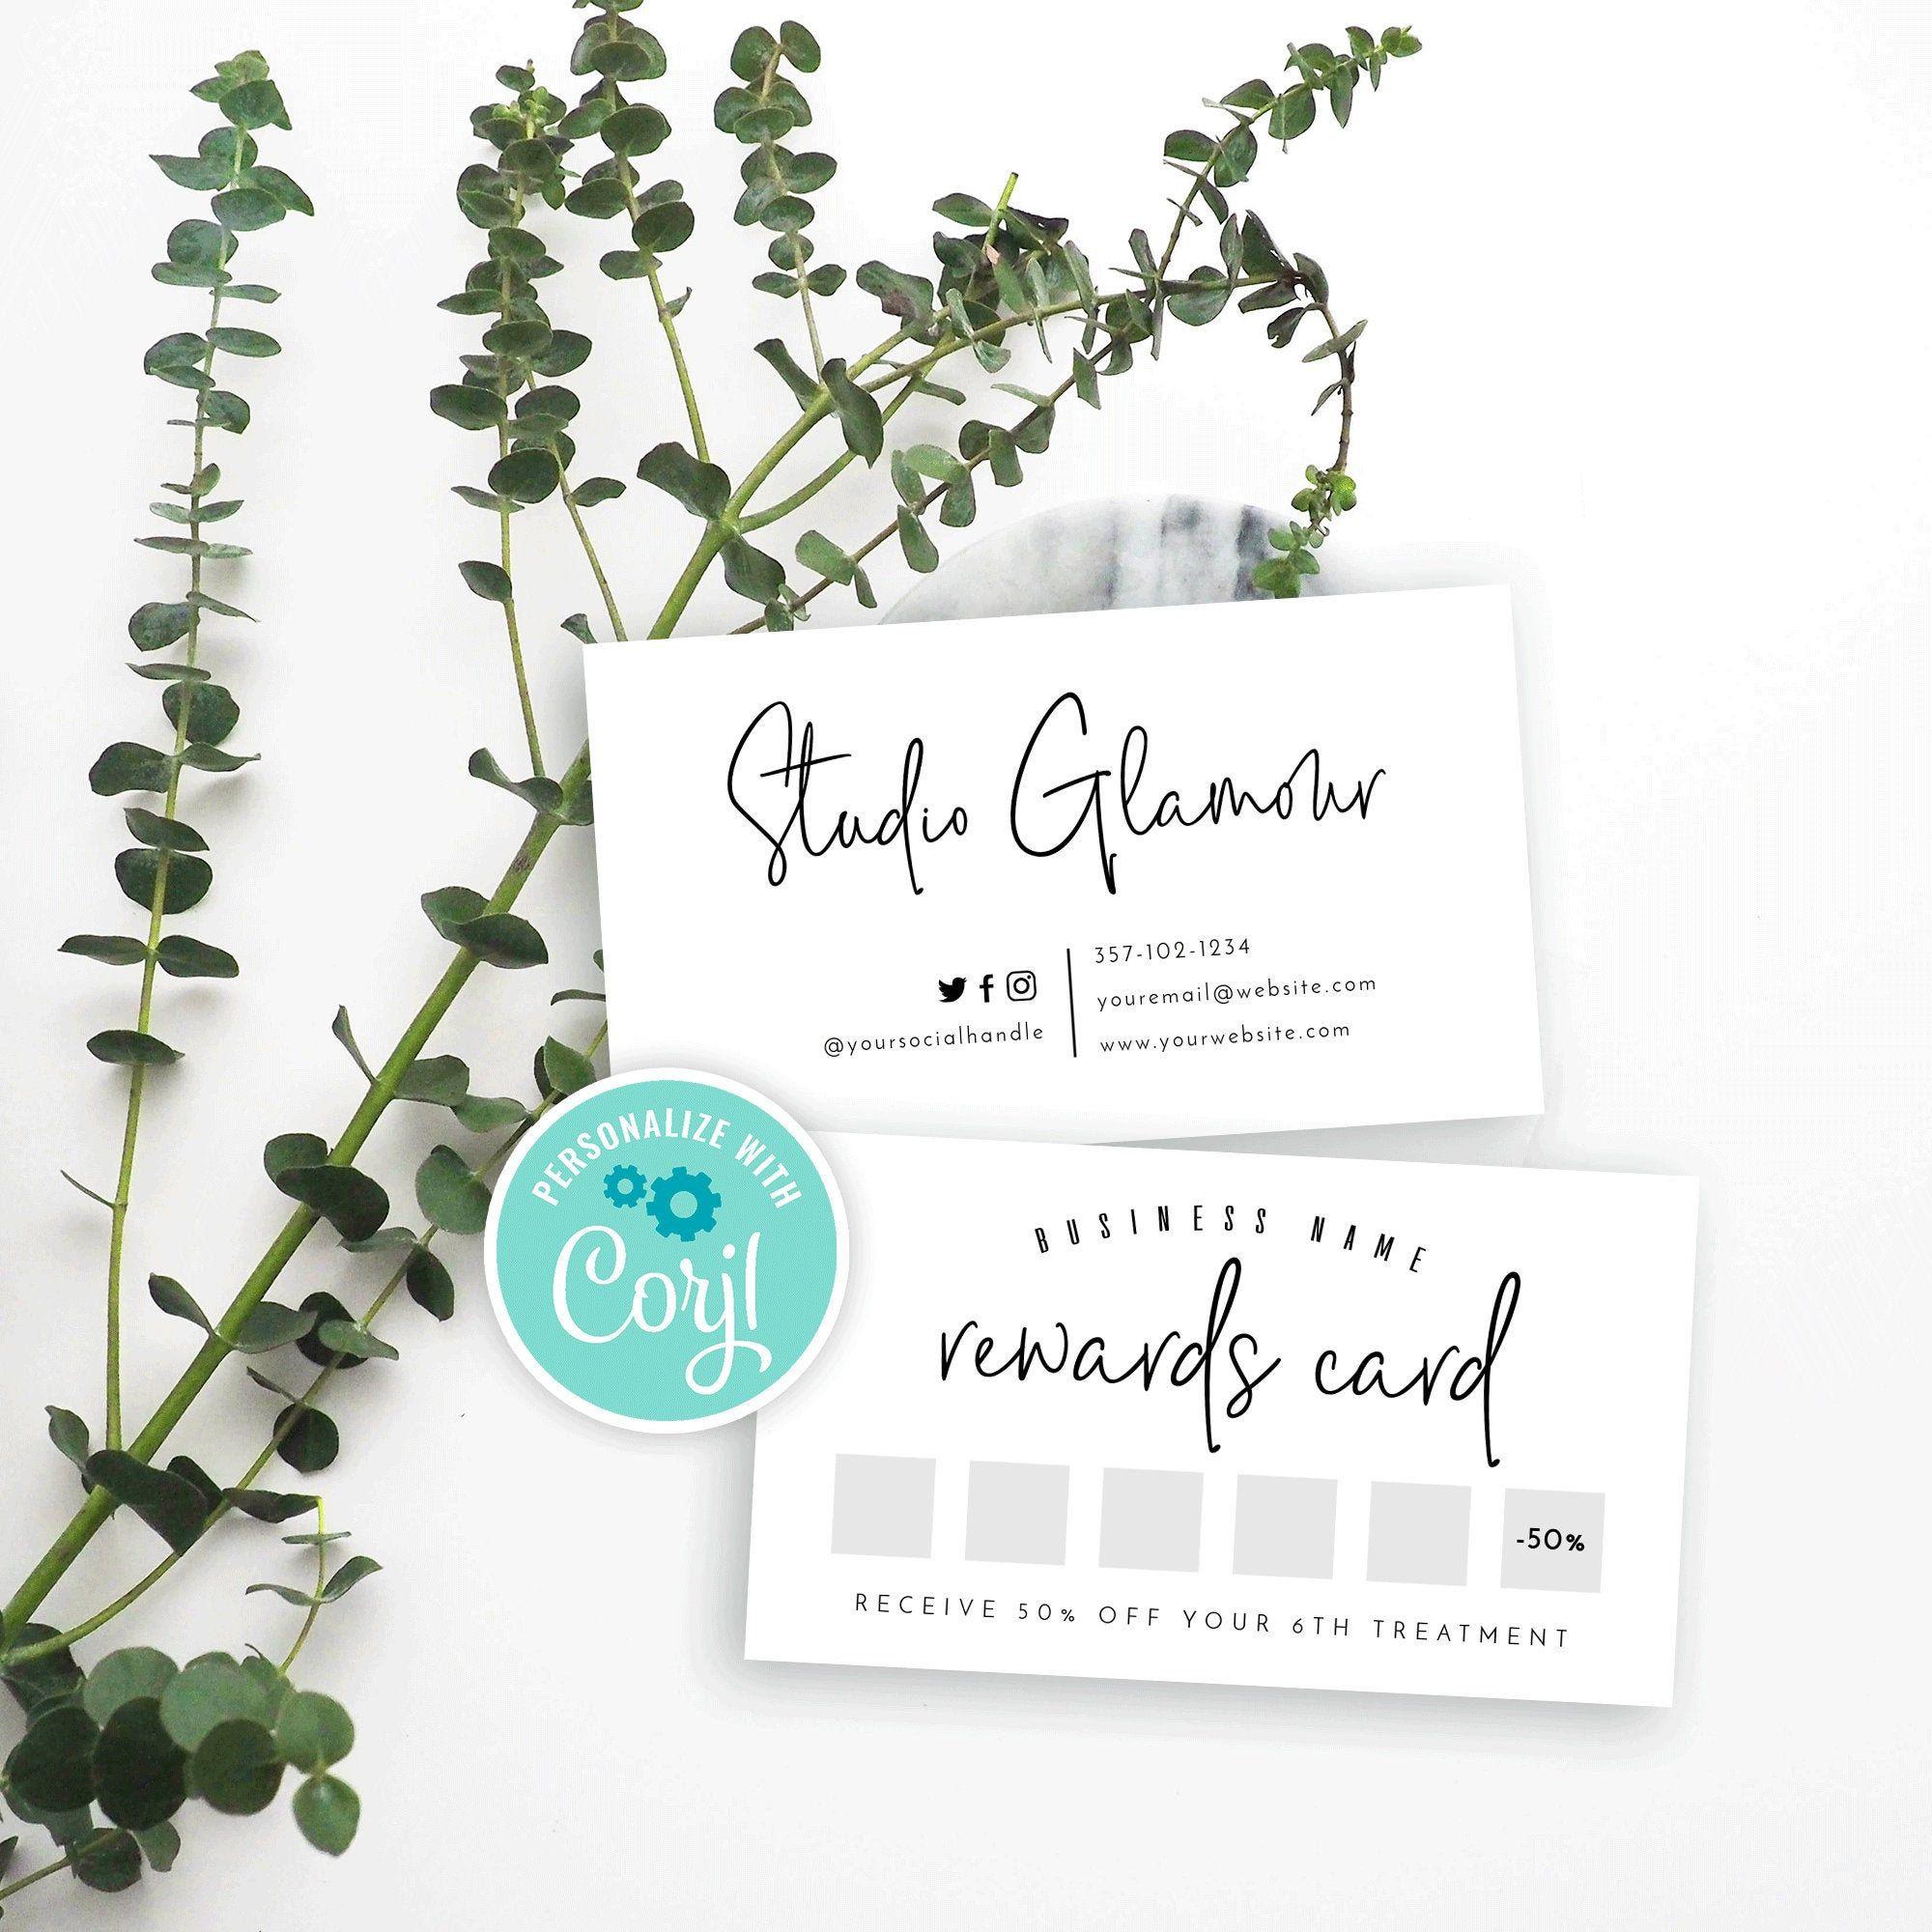 Printable Loyalty Card Design Minimalist Rewards Card Etsy Loyalty Card Design Loyalty Card Template Card Design